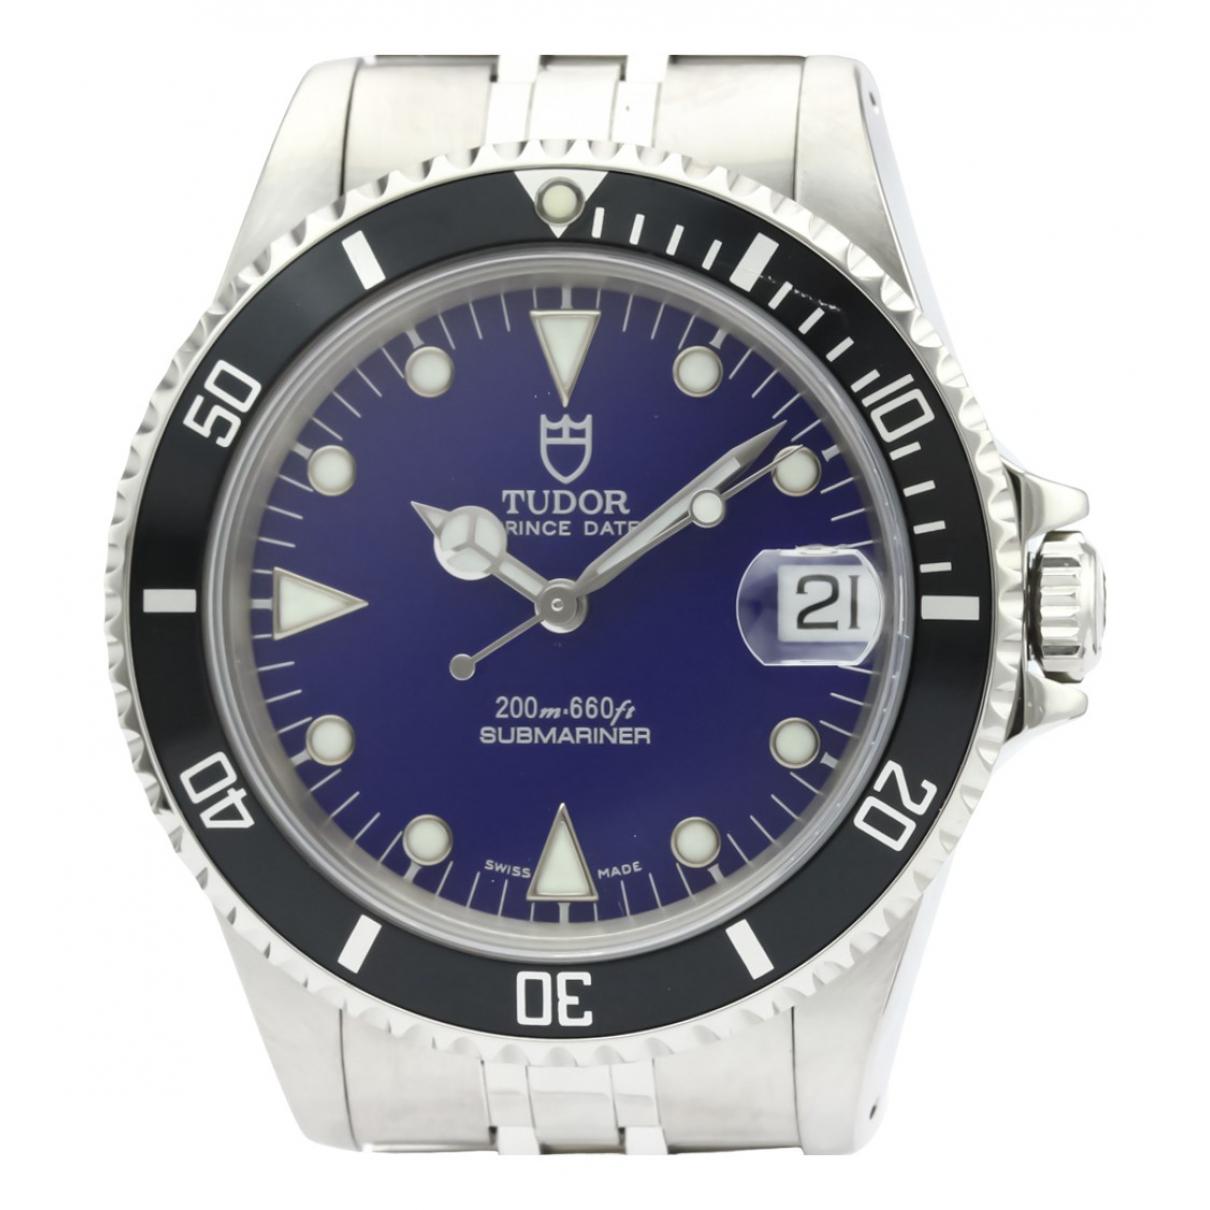 Relojes Submariner Tudor